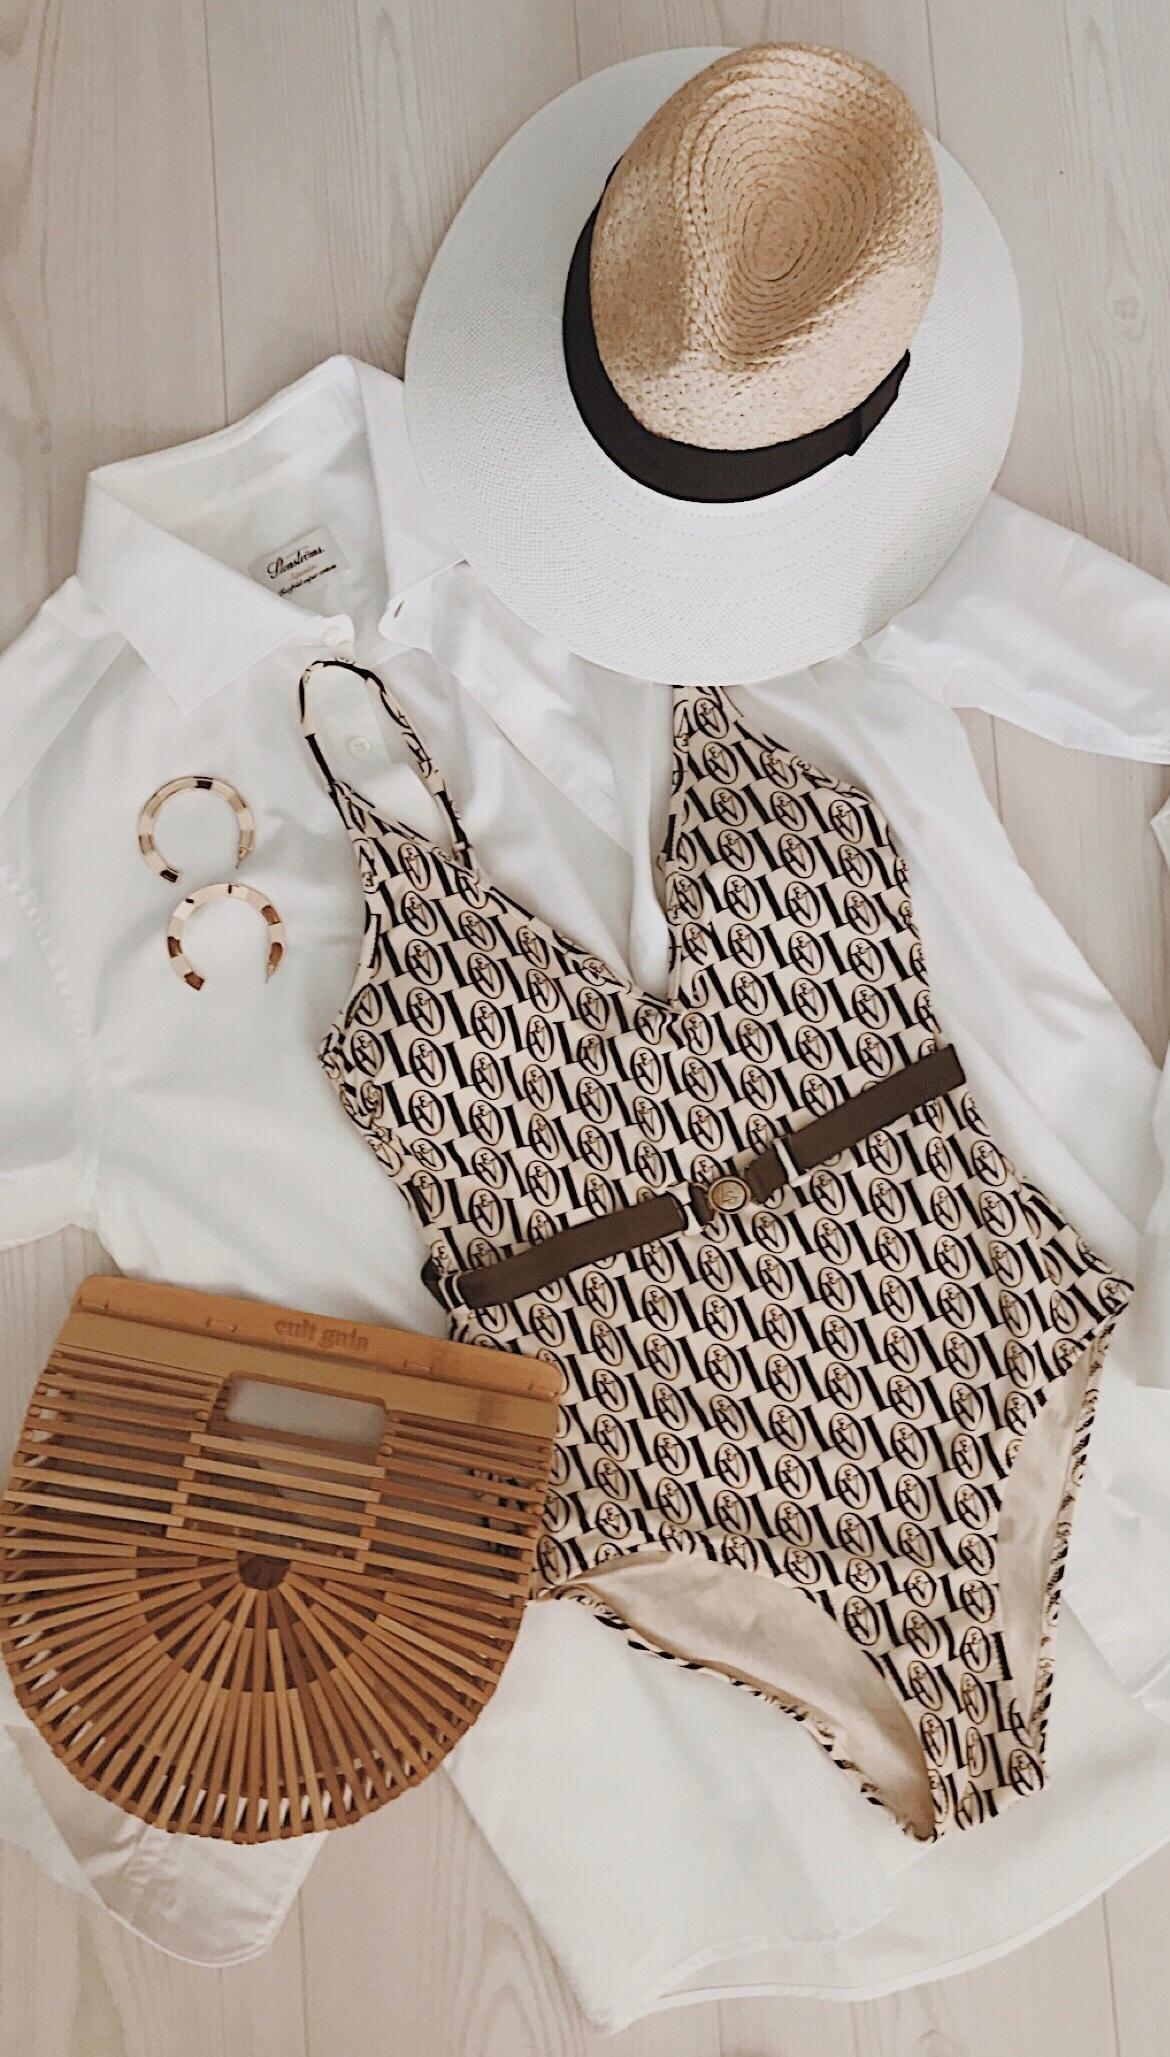 www.lindahaggh.com+outfit+det.jpg